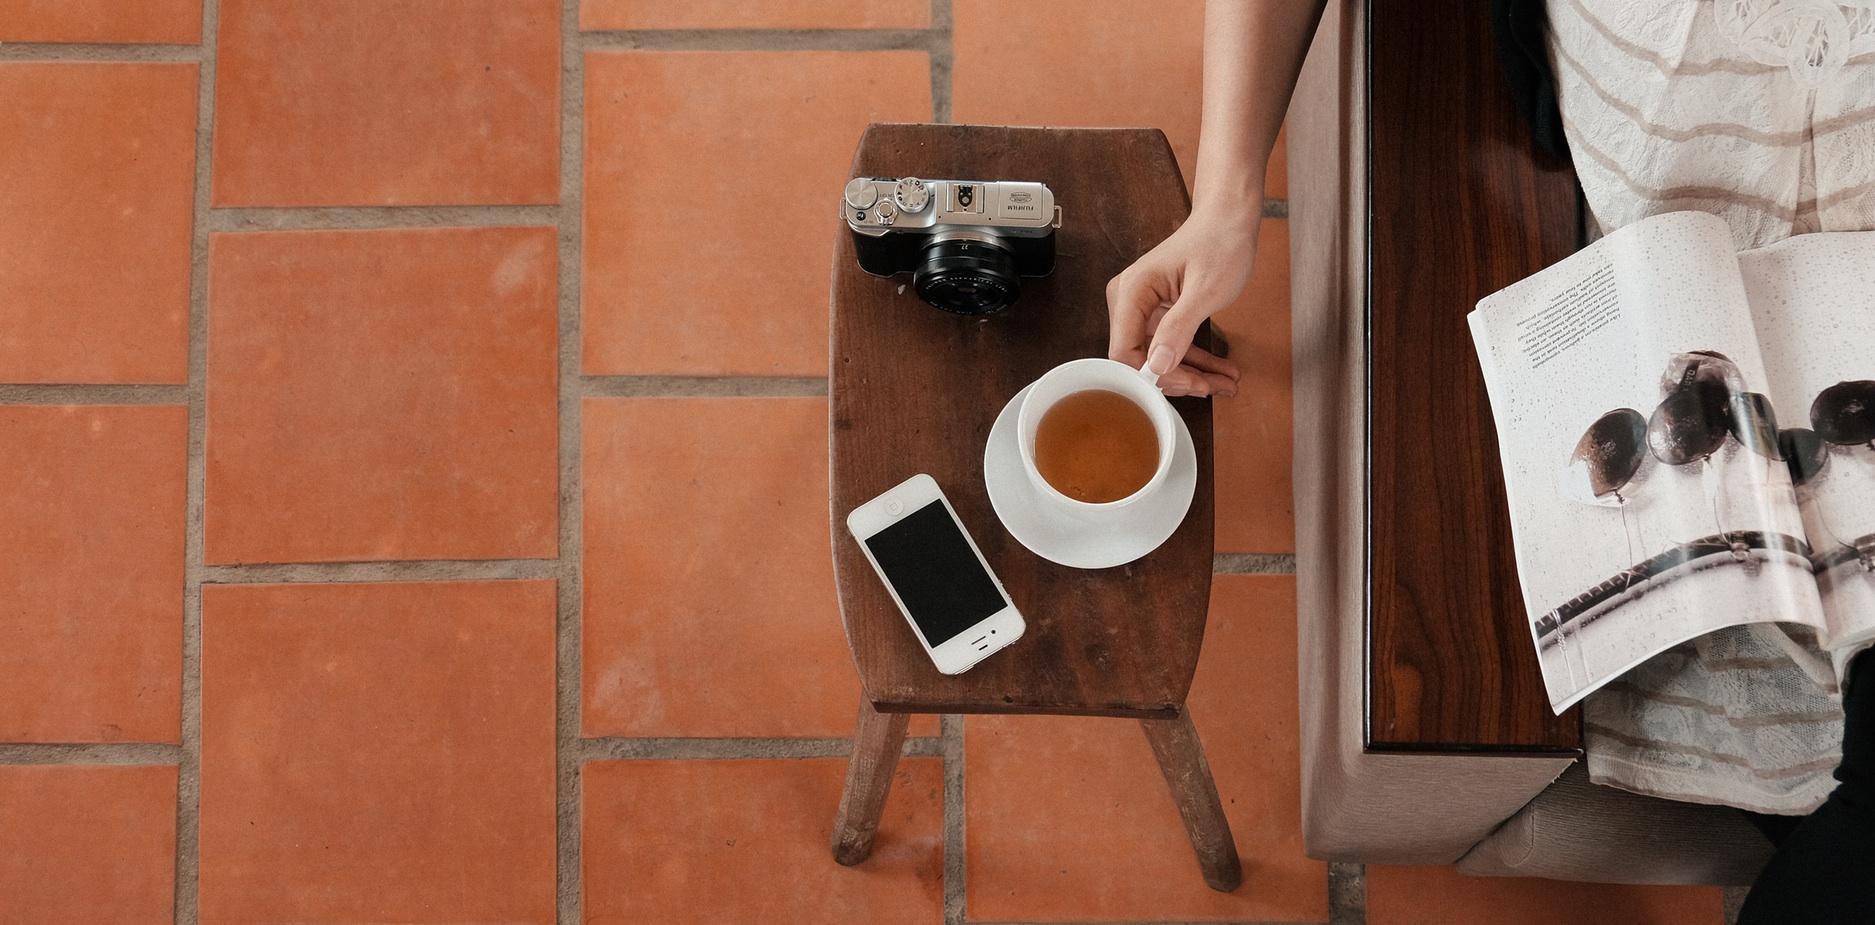 holy crap, focus on coffee!!